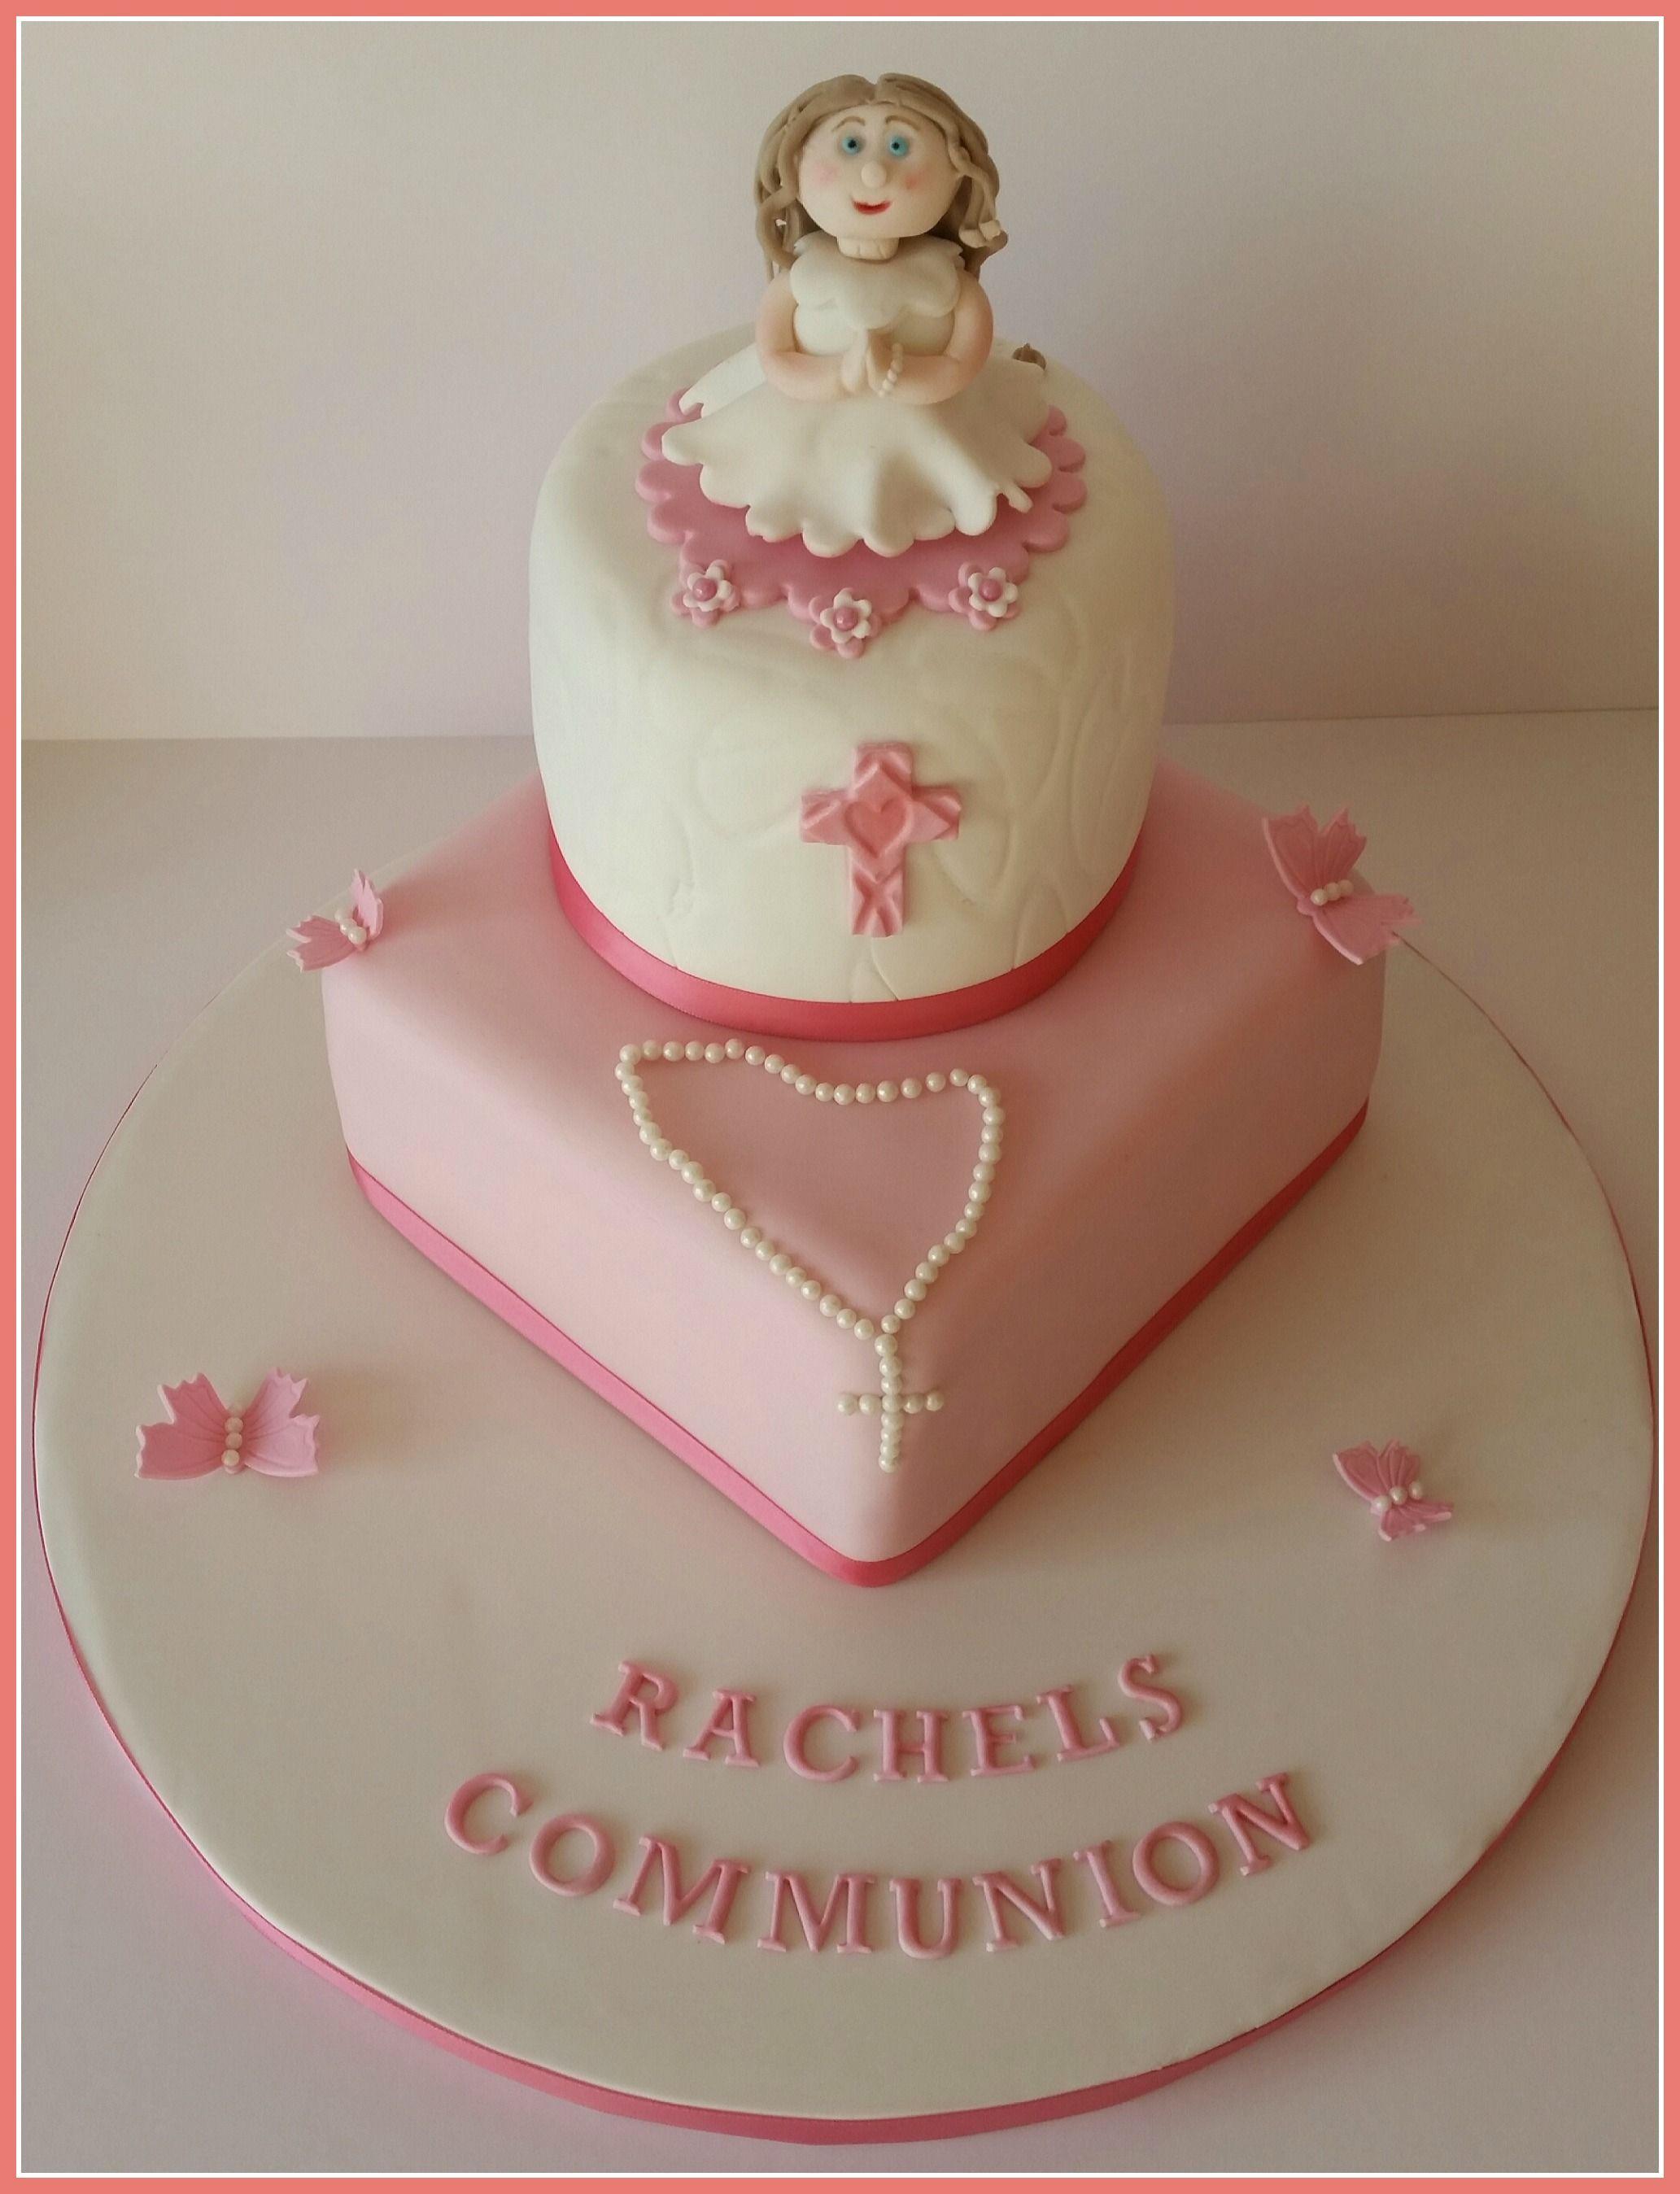 Girls Communion Cake with handmade fondant girl by Cáca